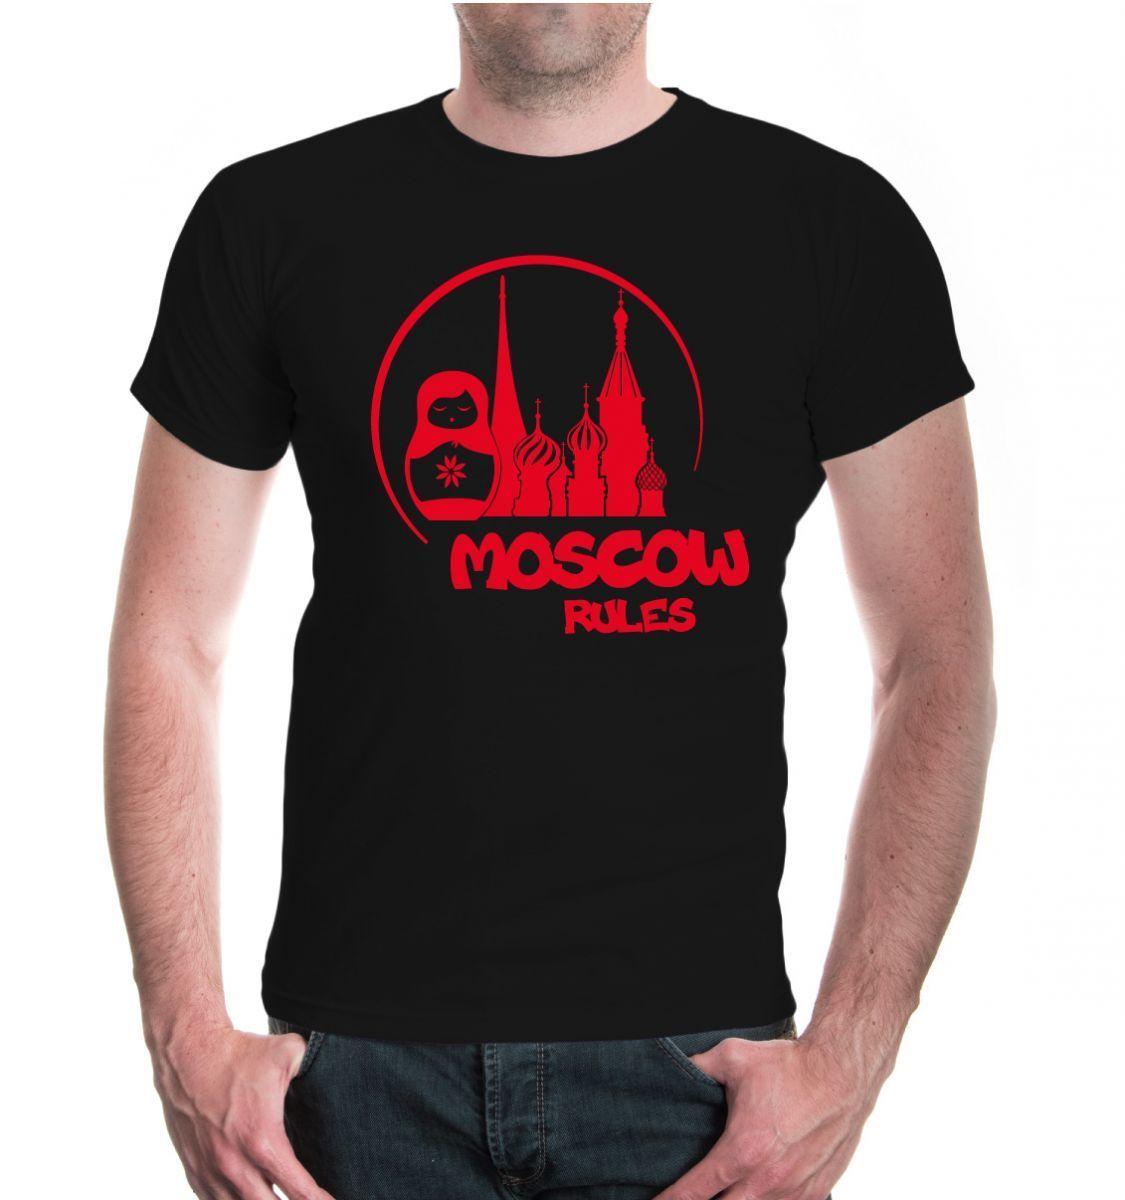 Herren унисекс Kurzarm футболка с Москвой правила силуэт Moskau Russland City Stadt|Мужские